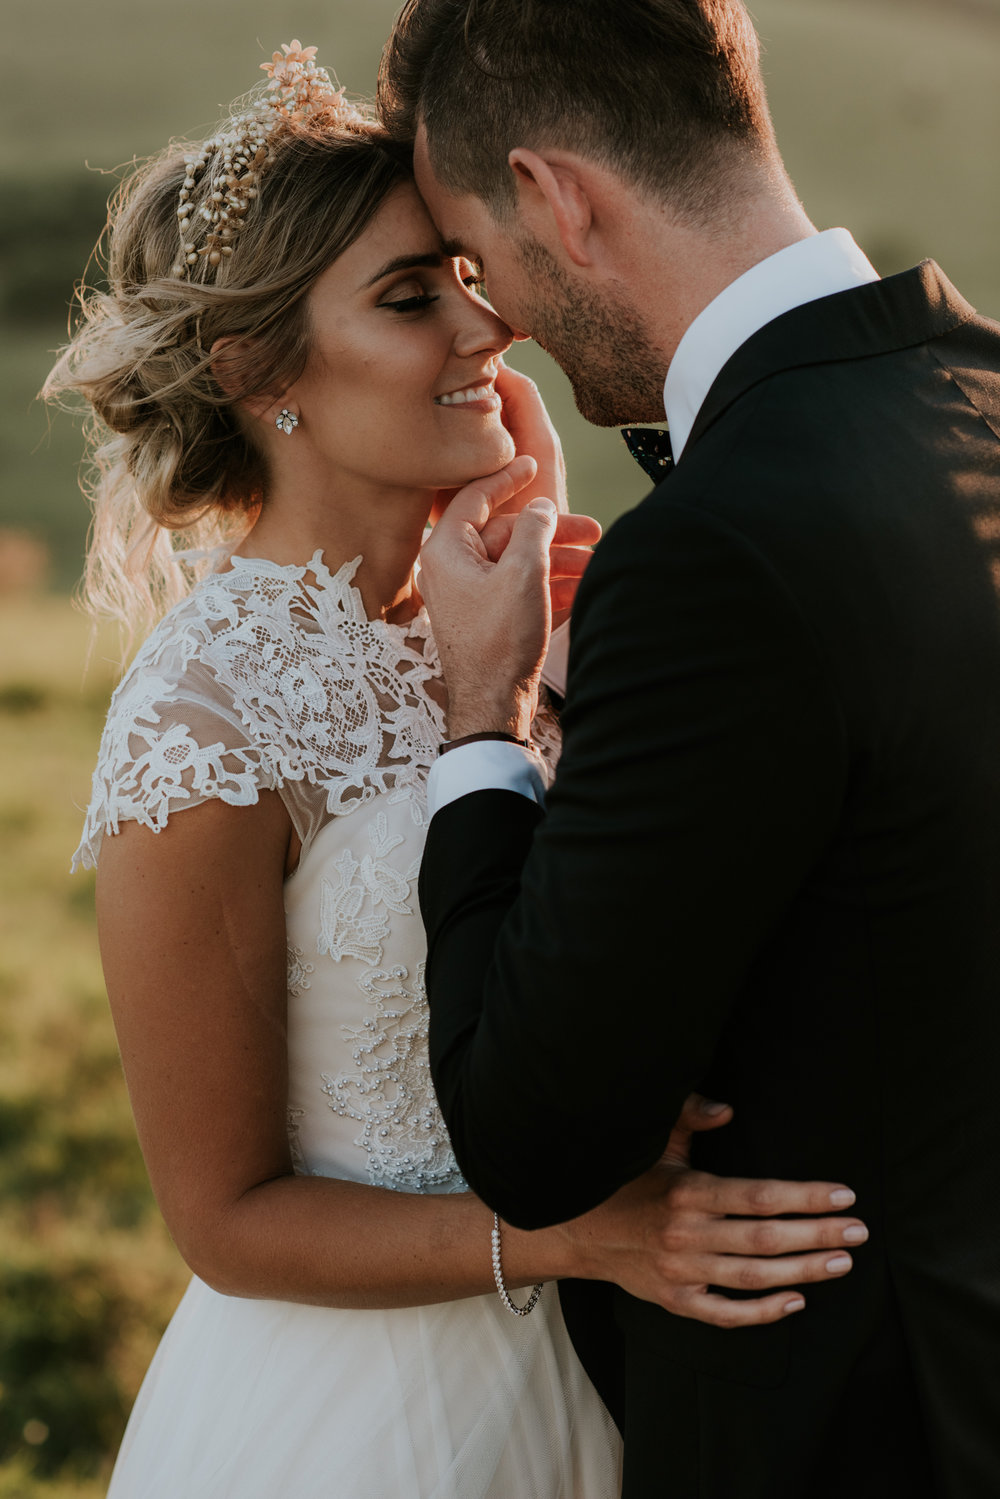 Byron Bay Wedding Photographer | Engagement-Elopement Photography-84.jpg